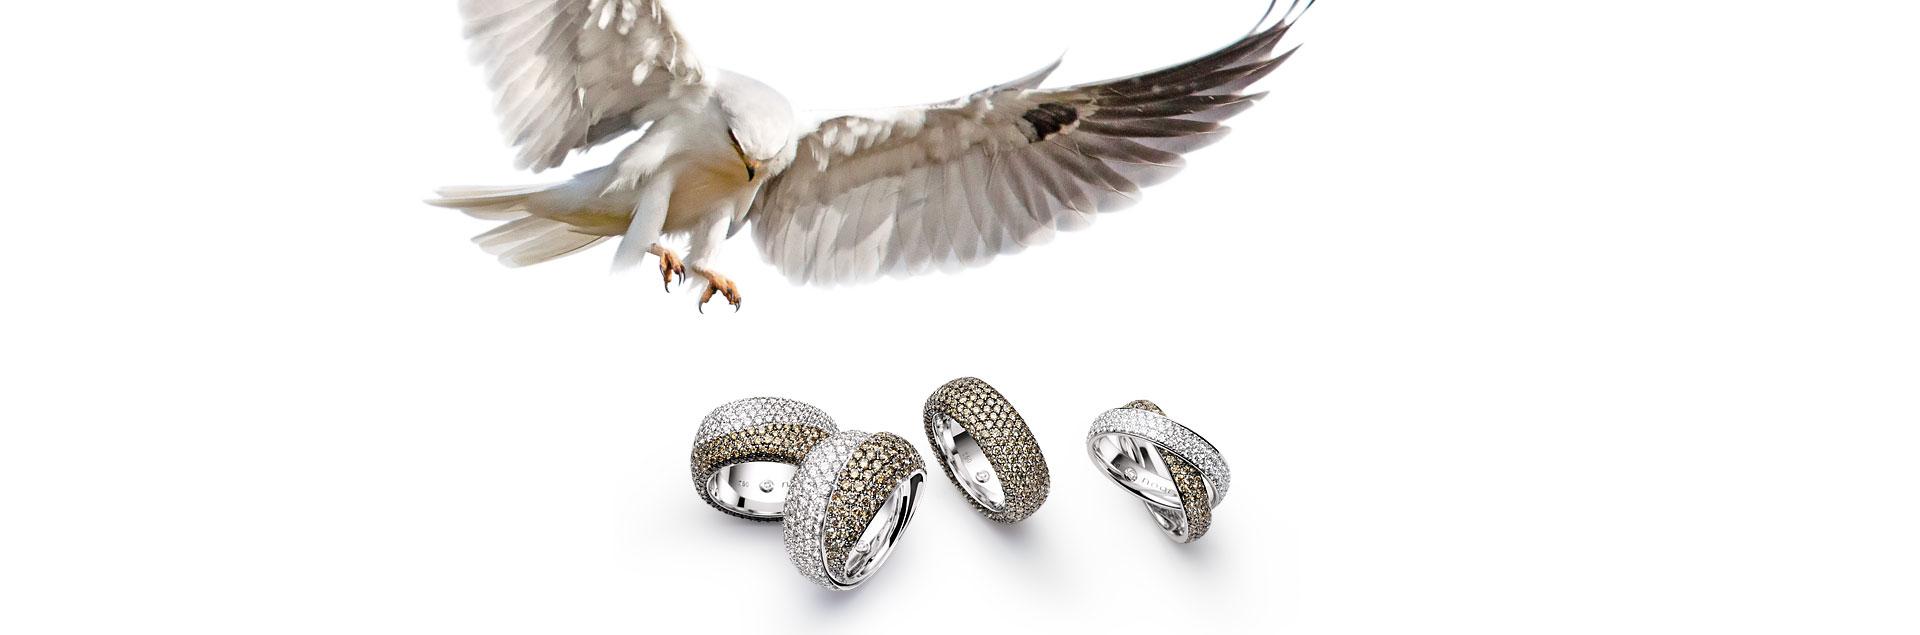 noor-by-wurster-diamonds_white-tale-kite2